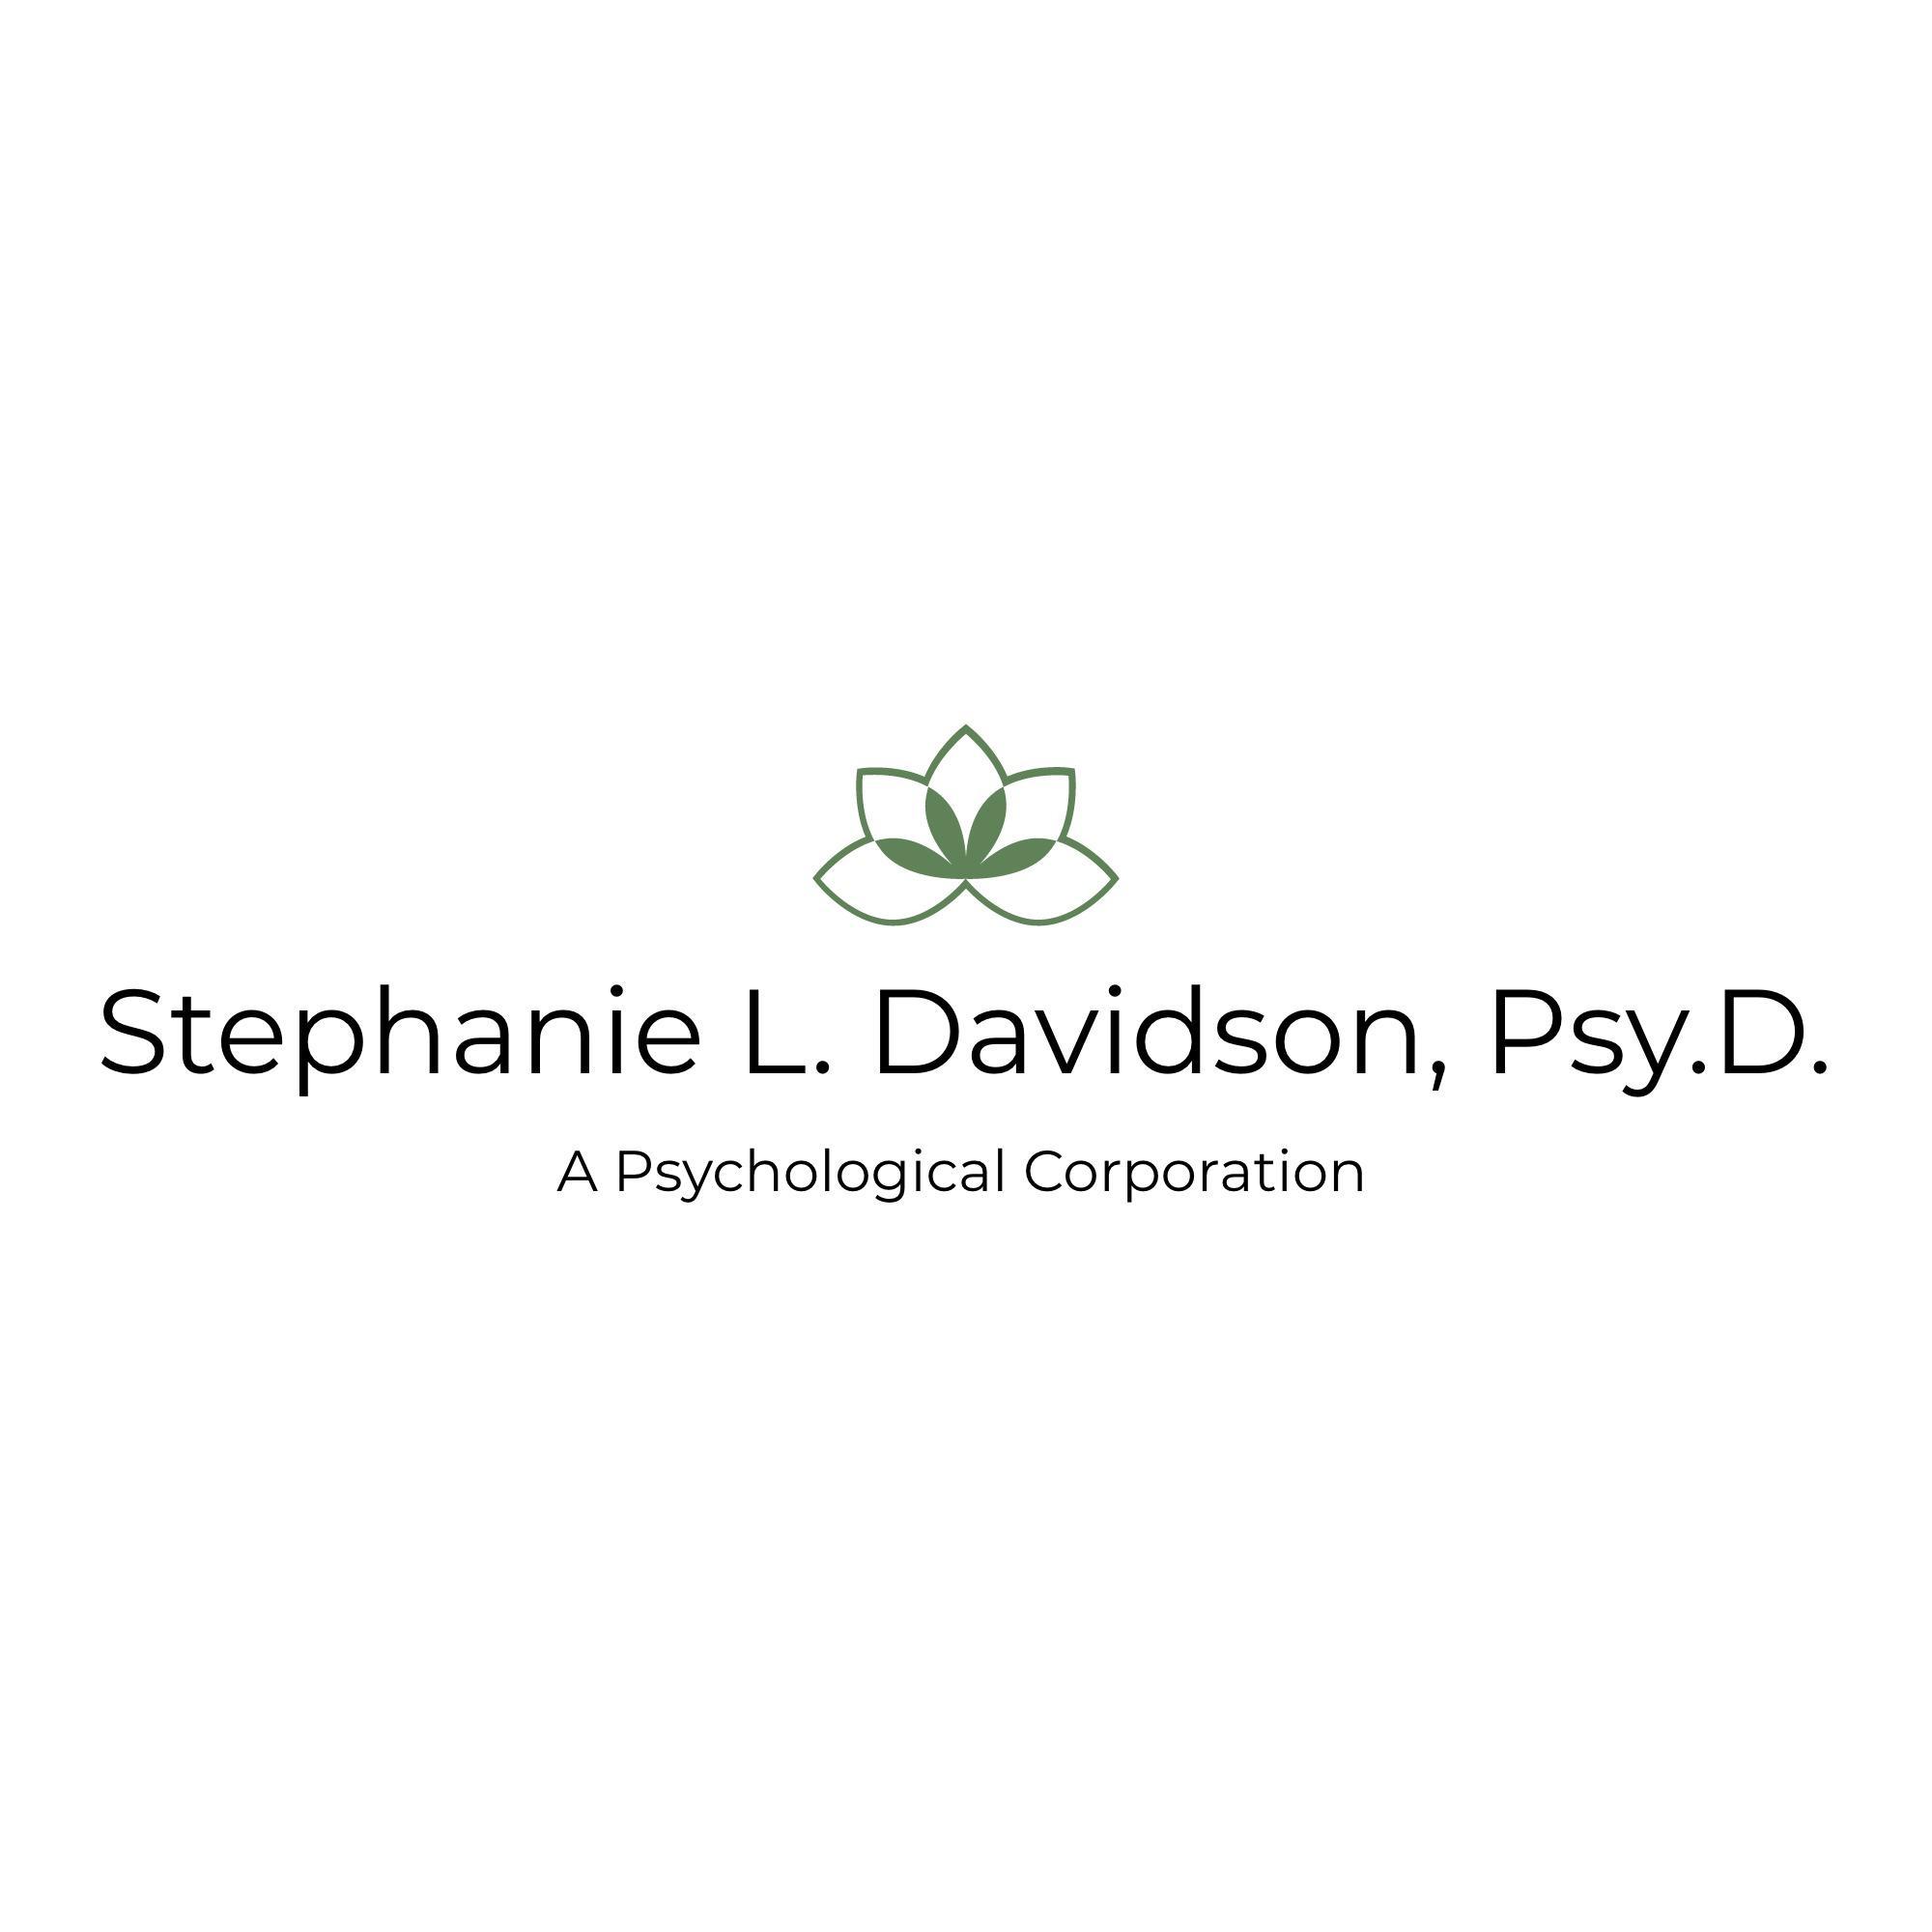 Stephanie L. Davidson, Psy.D. - Westlake Village, CA 91362 - (805)405-6945 | ShowMeLocal.com